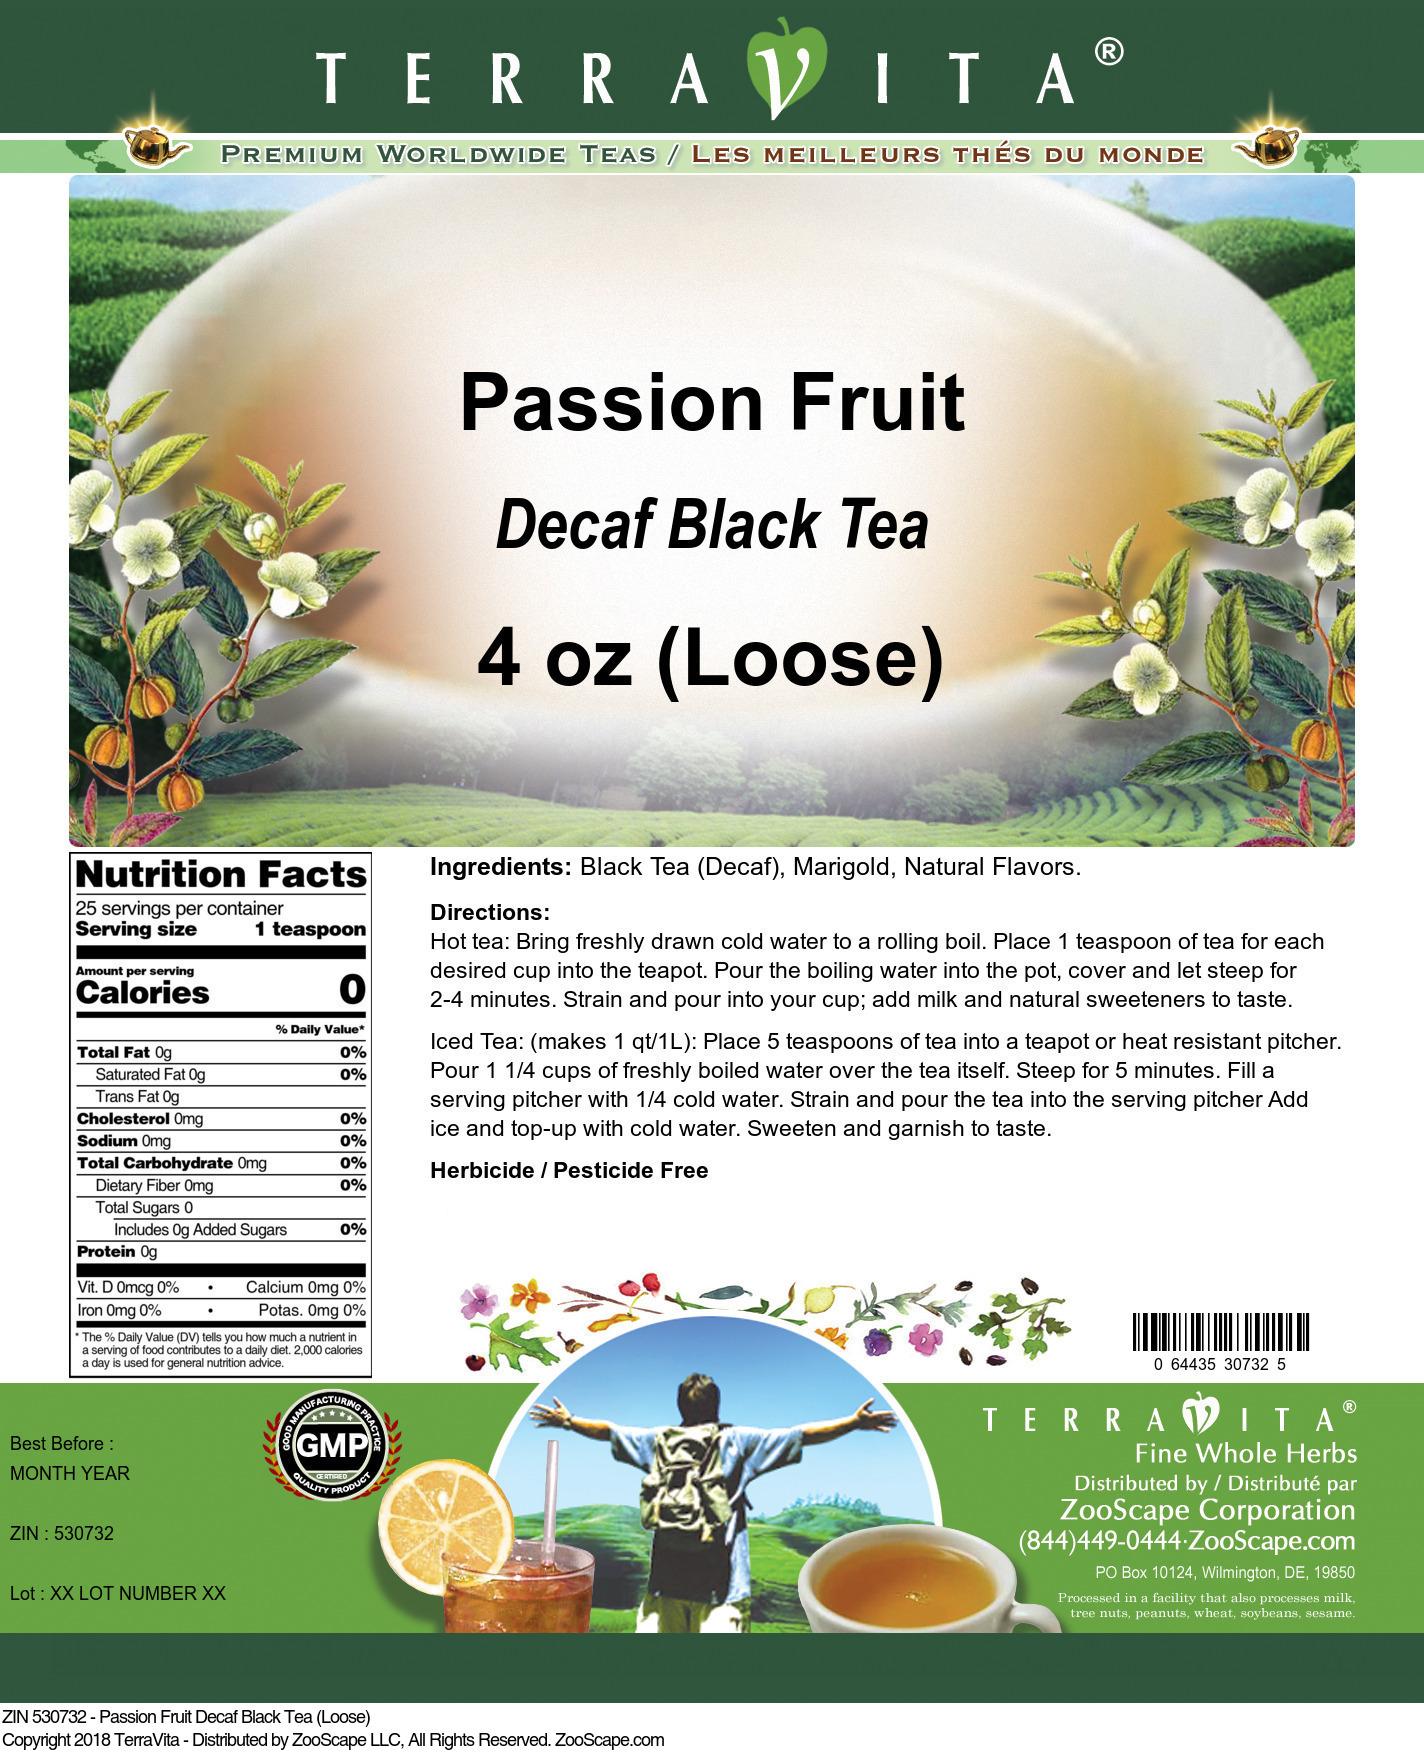 Passion Fruit Decaf Black Tea (Loose)